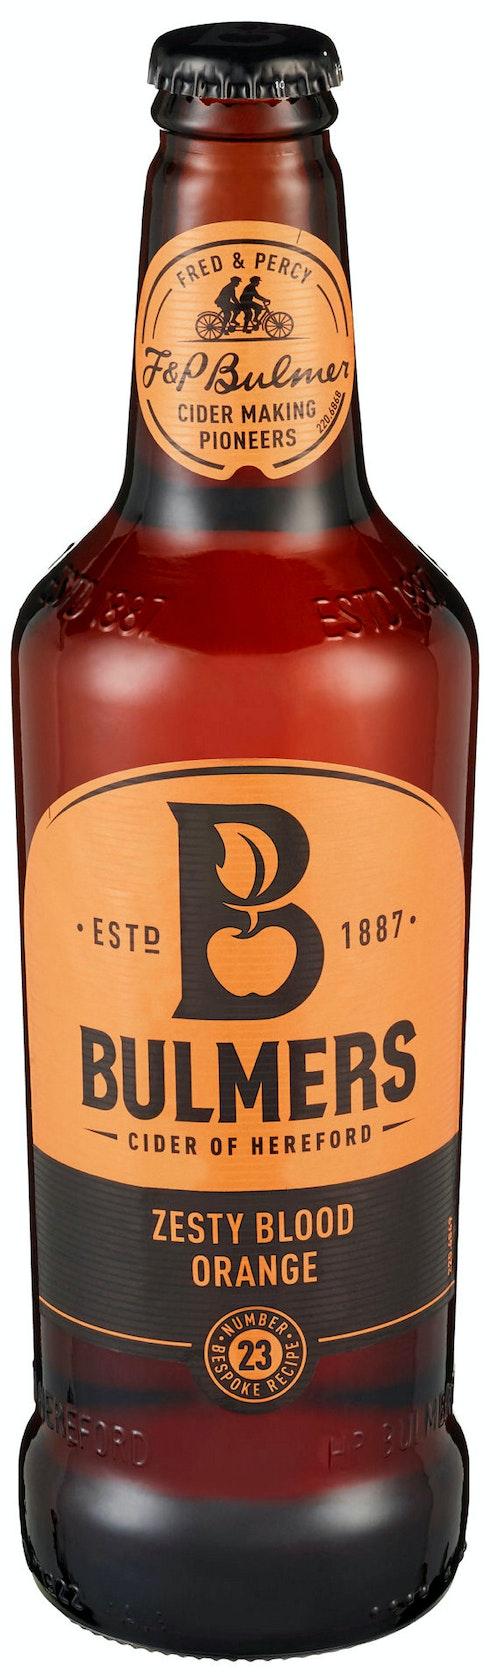 Bulmers Bulmers Cider Zesty Blood Orange 0,5 l